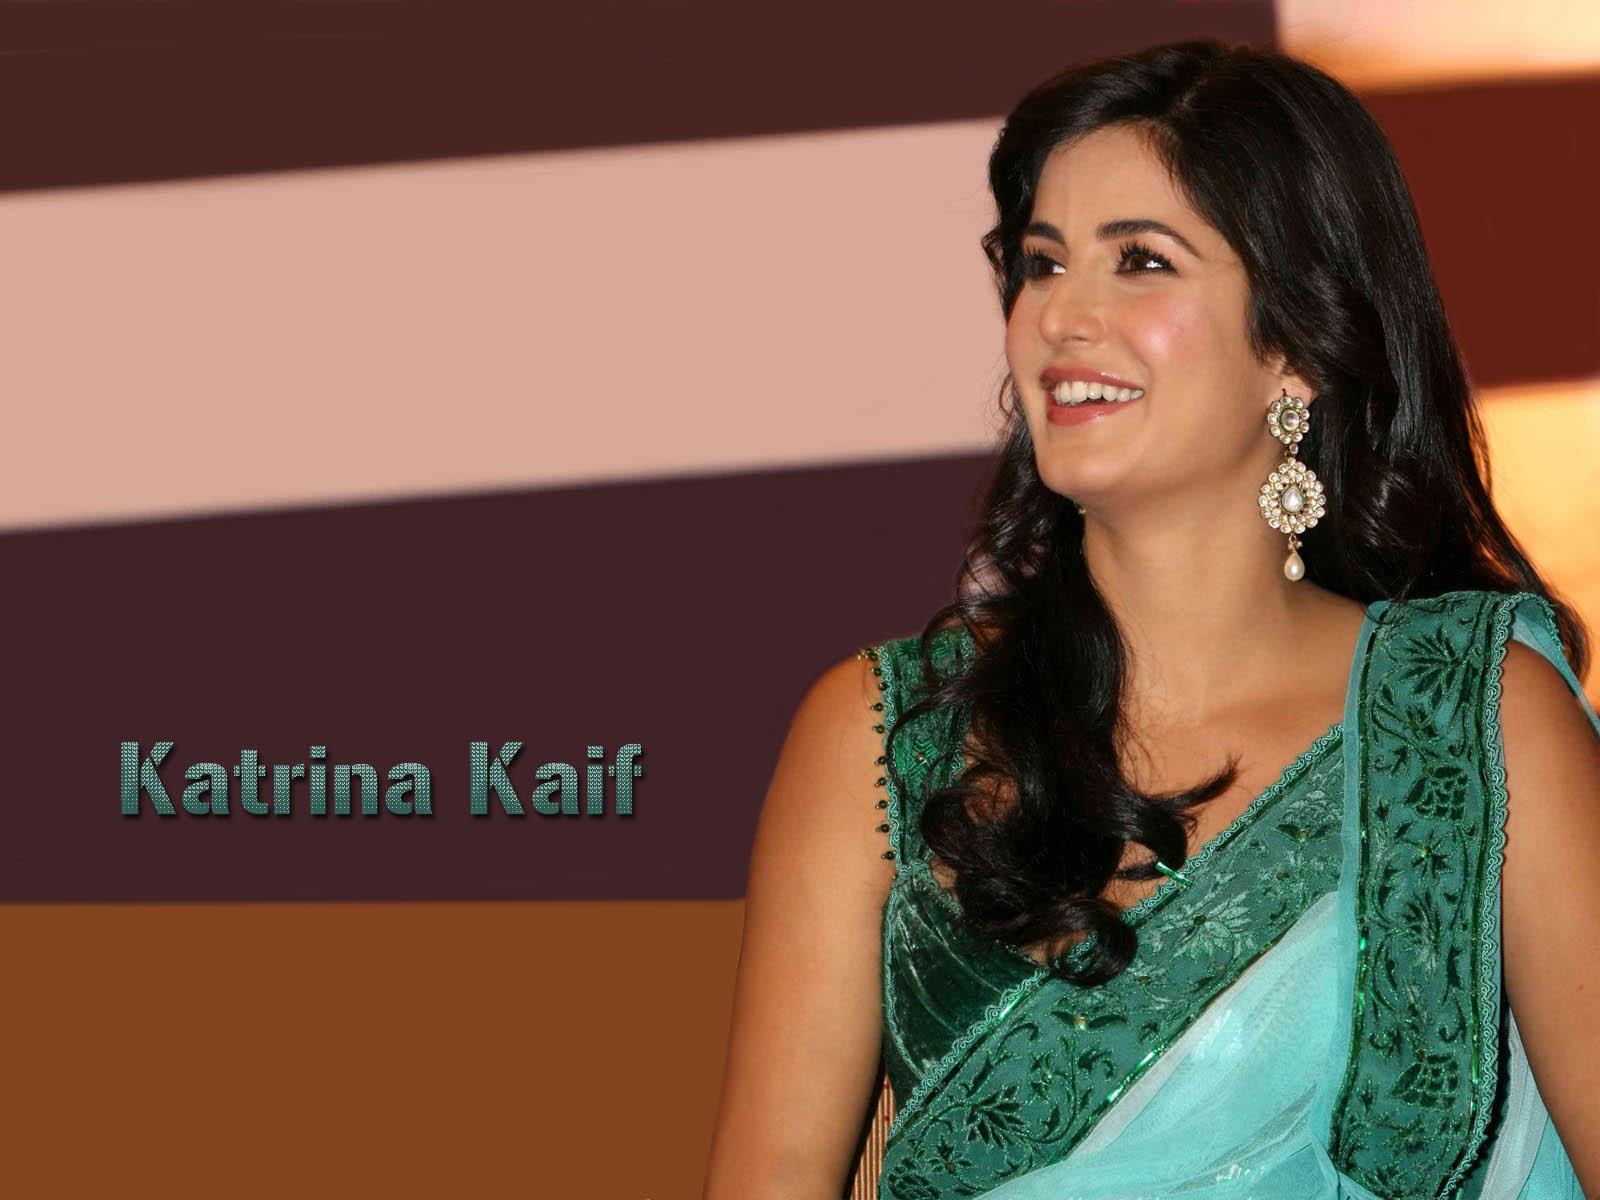 Katrina Kaif Cute Wallpapers 1600x1200